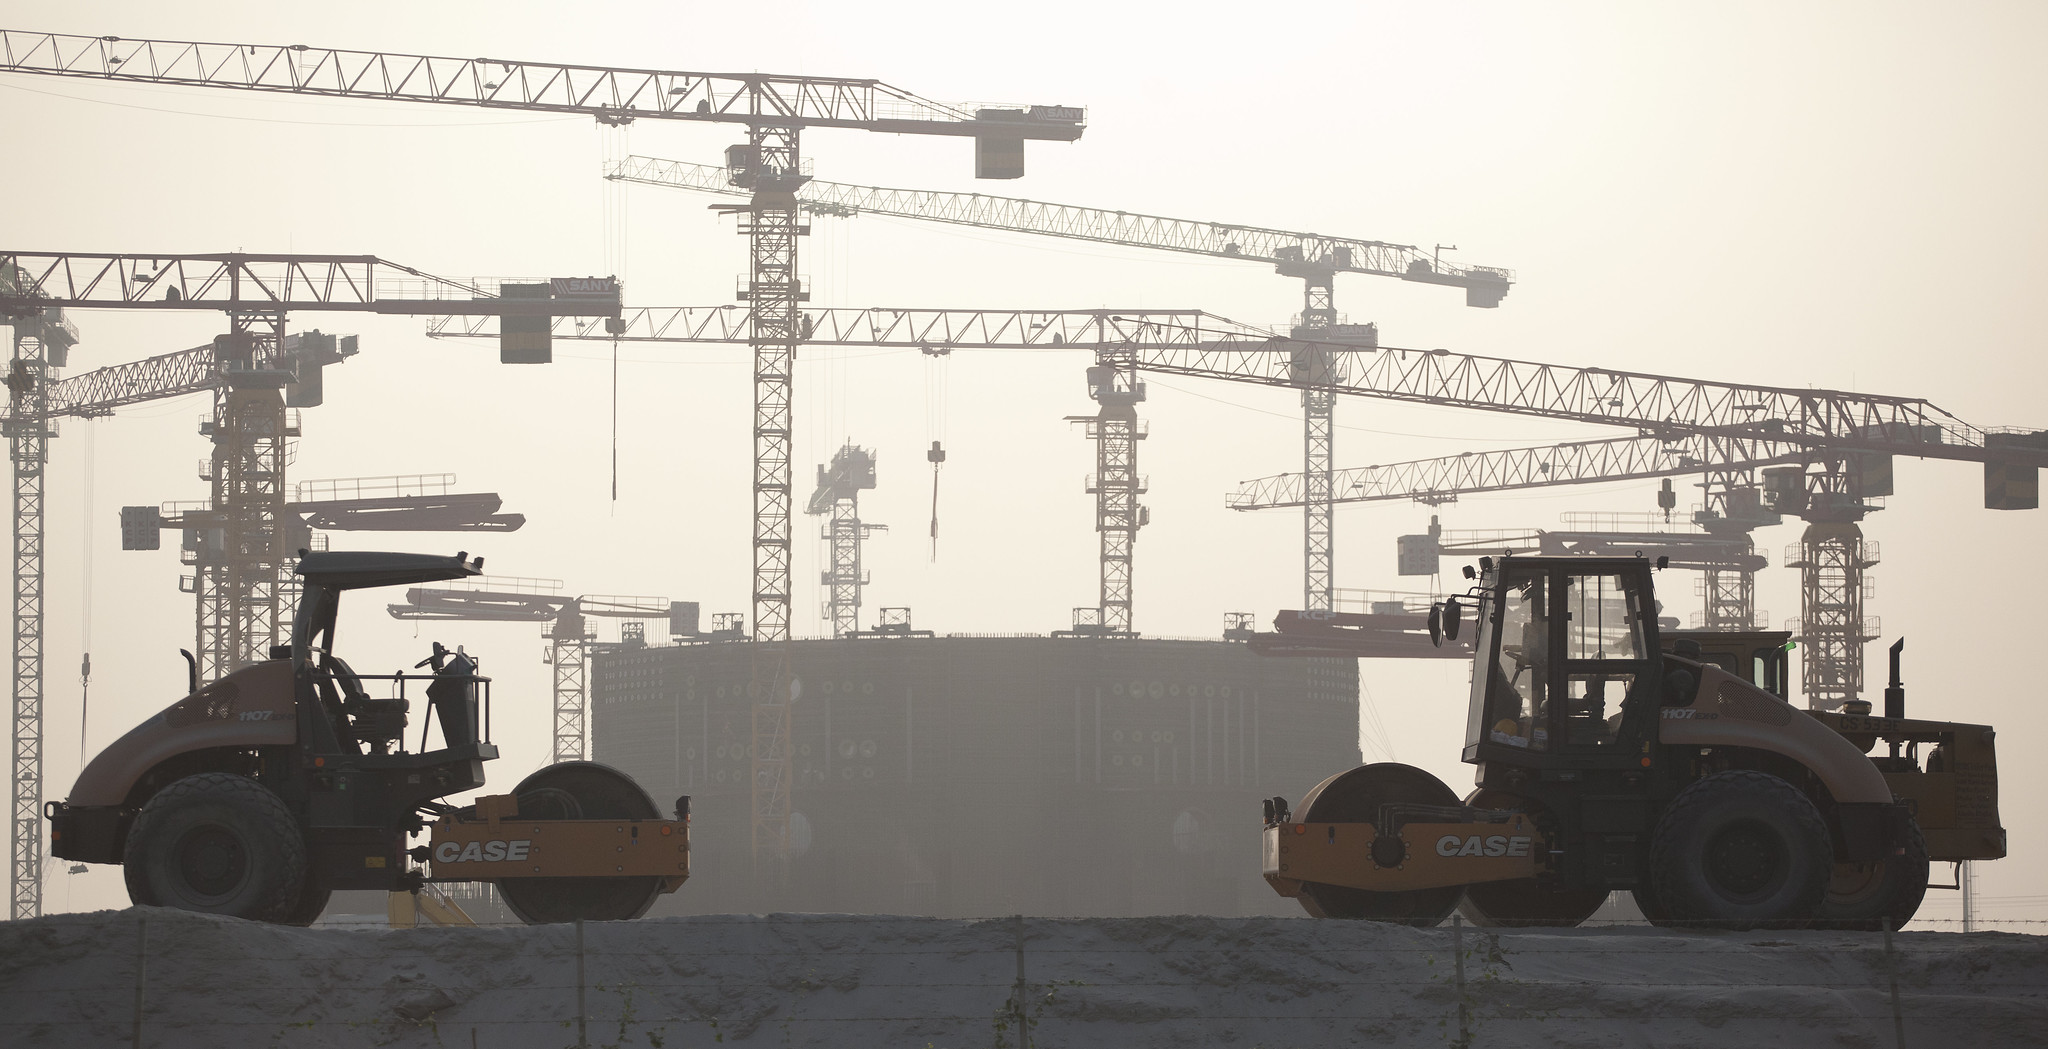 jaderná energie - Rosatom chce v roce 2020 udržet portfolio zahraničních zakázek na 140 miliardách dolarů - Zprávy (Výstavba jaderné elektrárny Rooppur v Bangladéši v roce 2019) 2